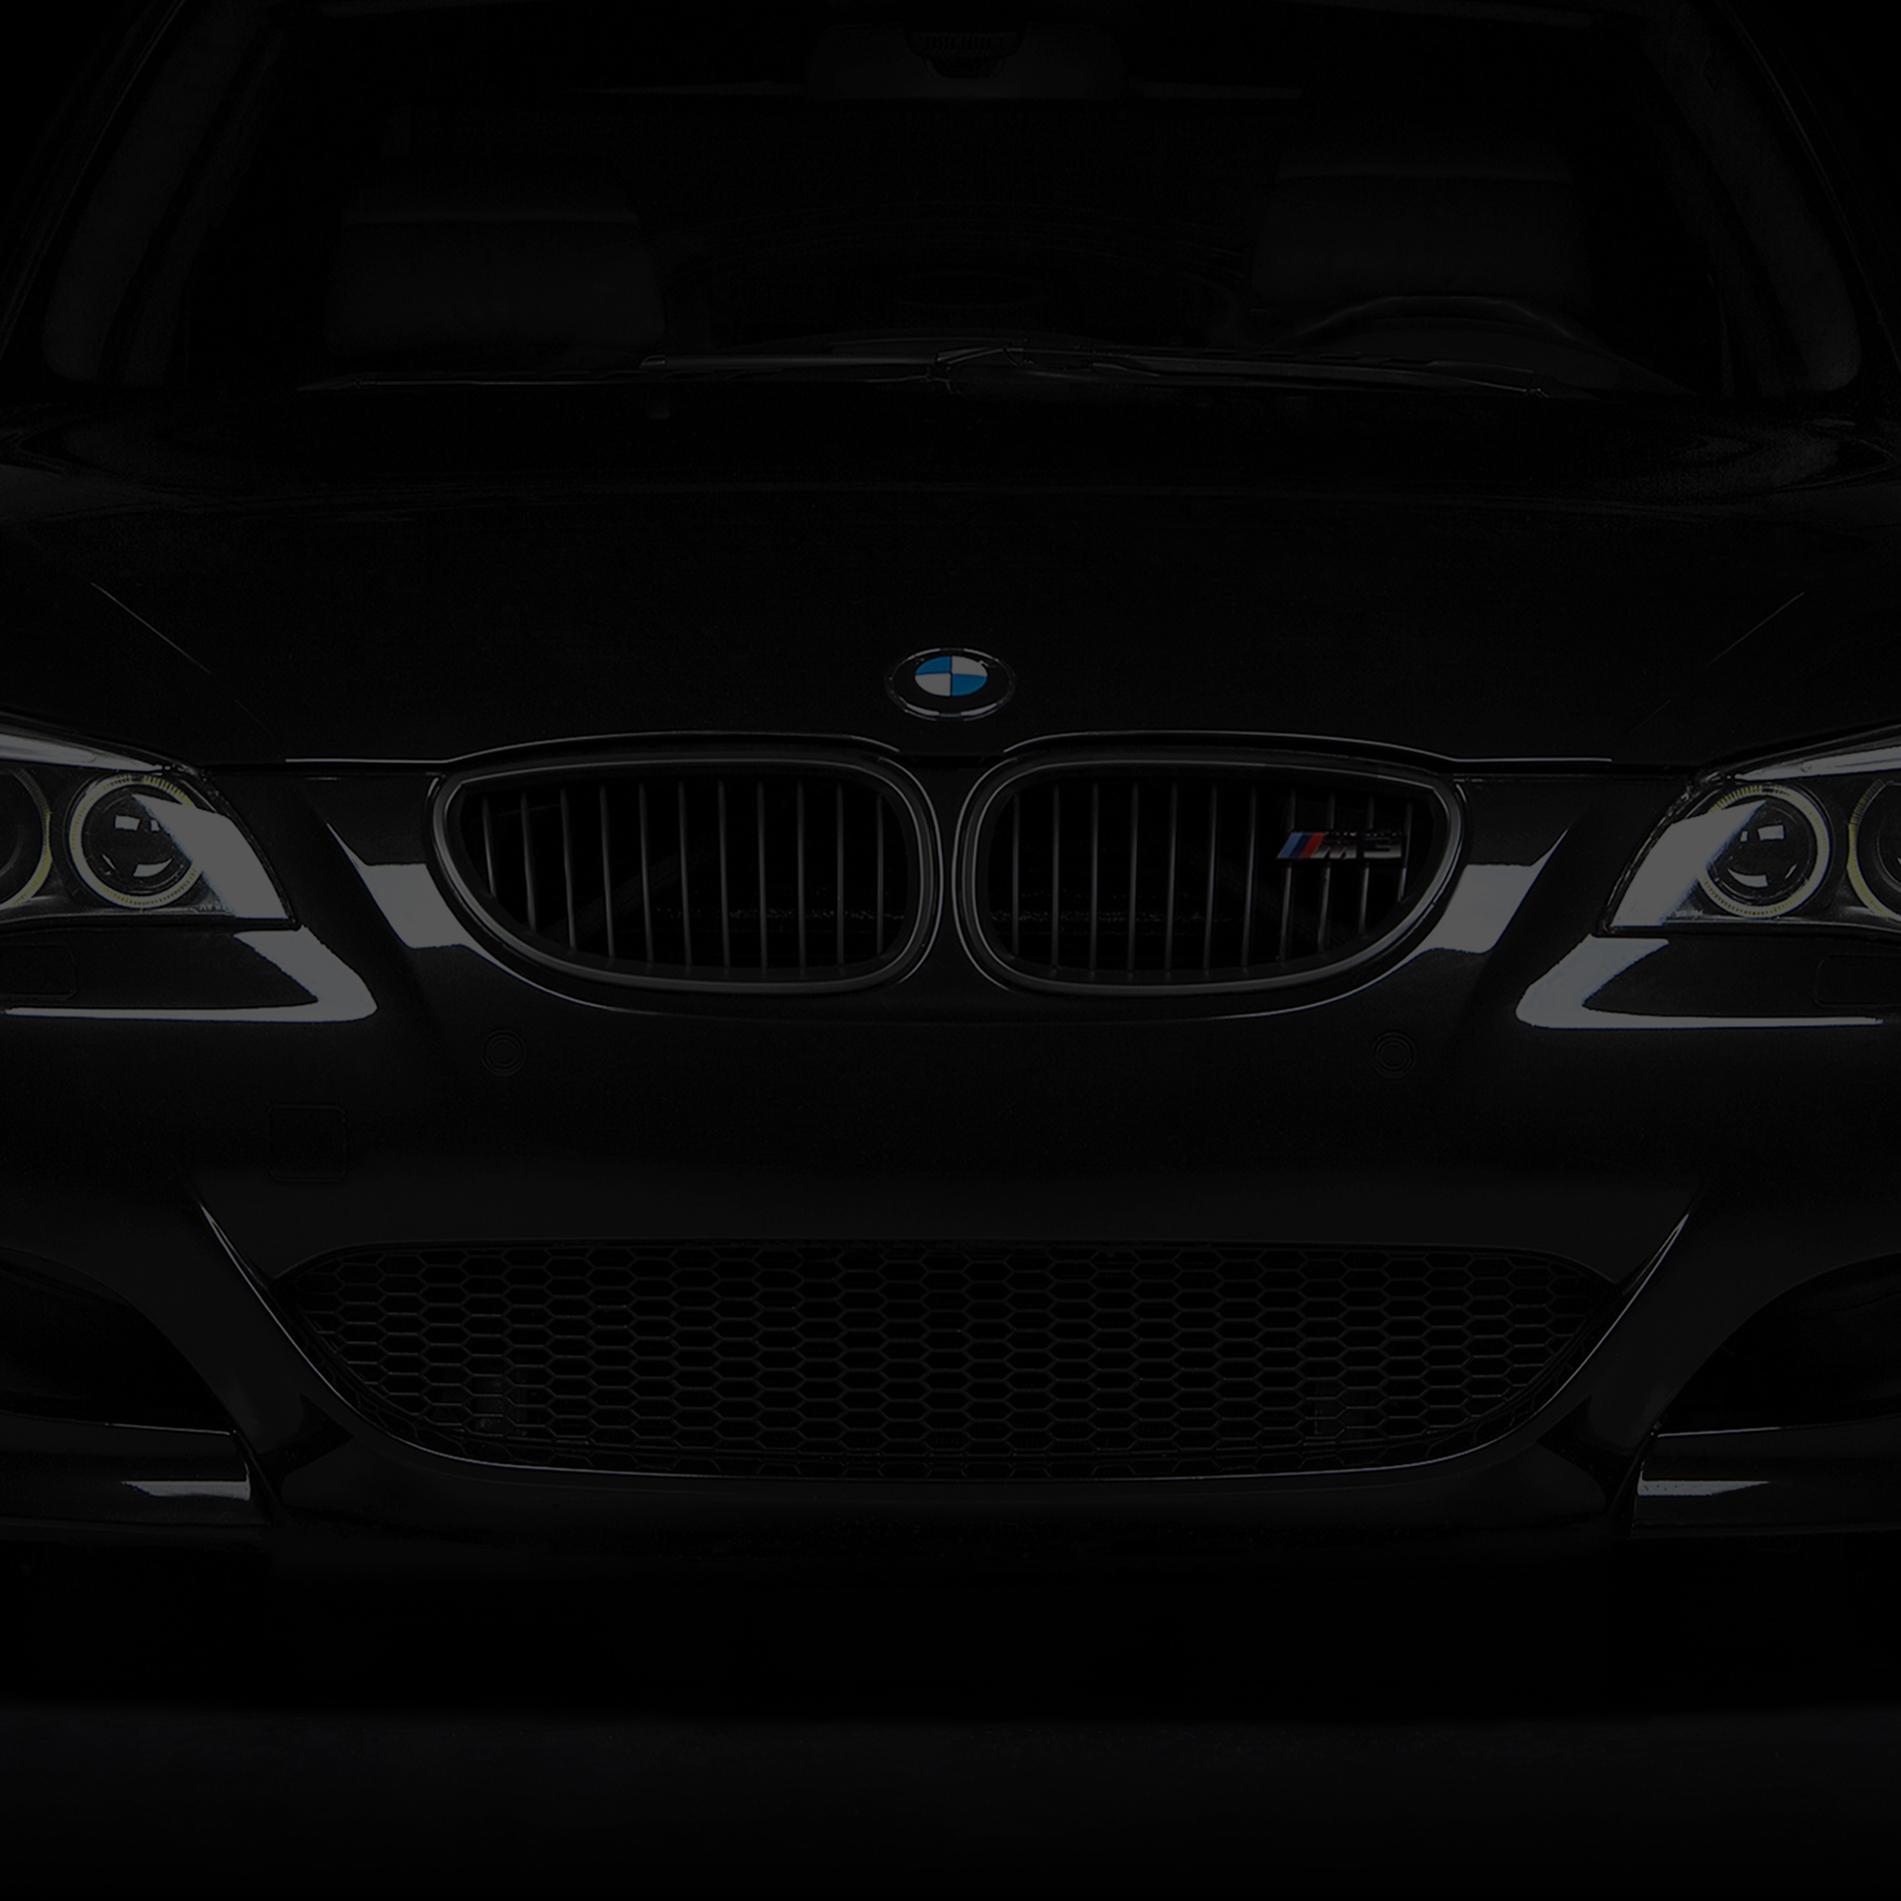 Kyle Puma-BMW-Mseries-M3-3 words-THUMB.jpg